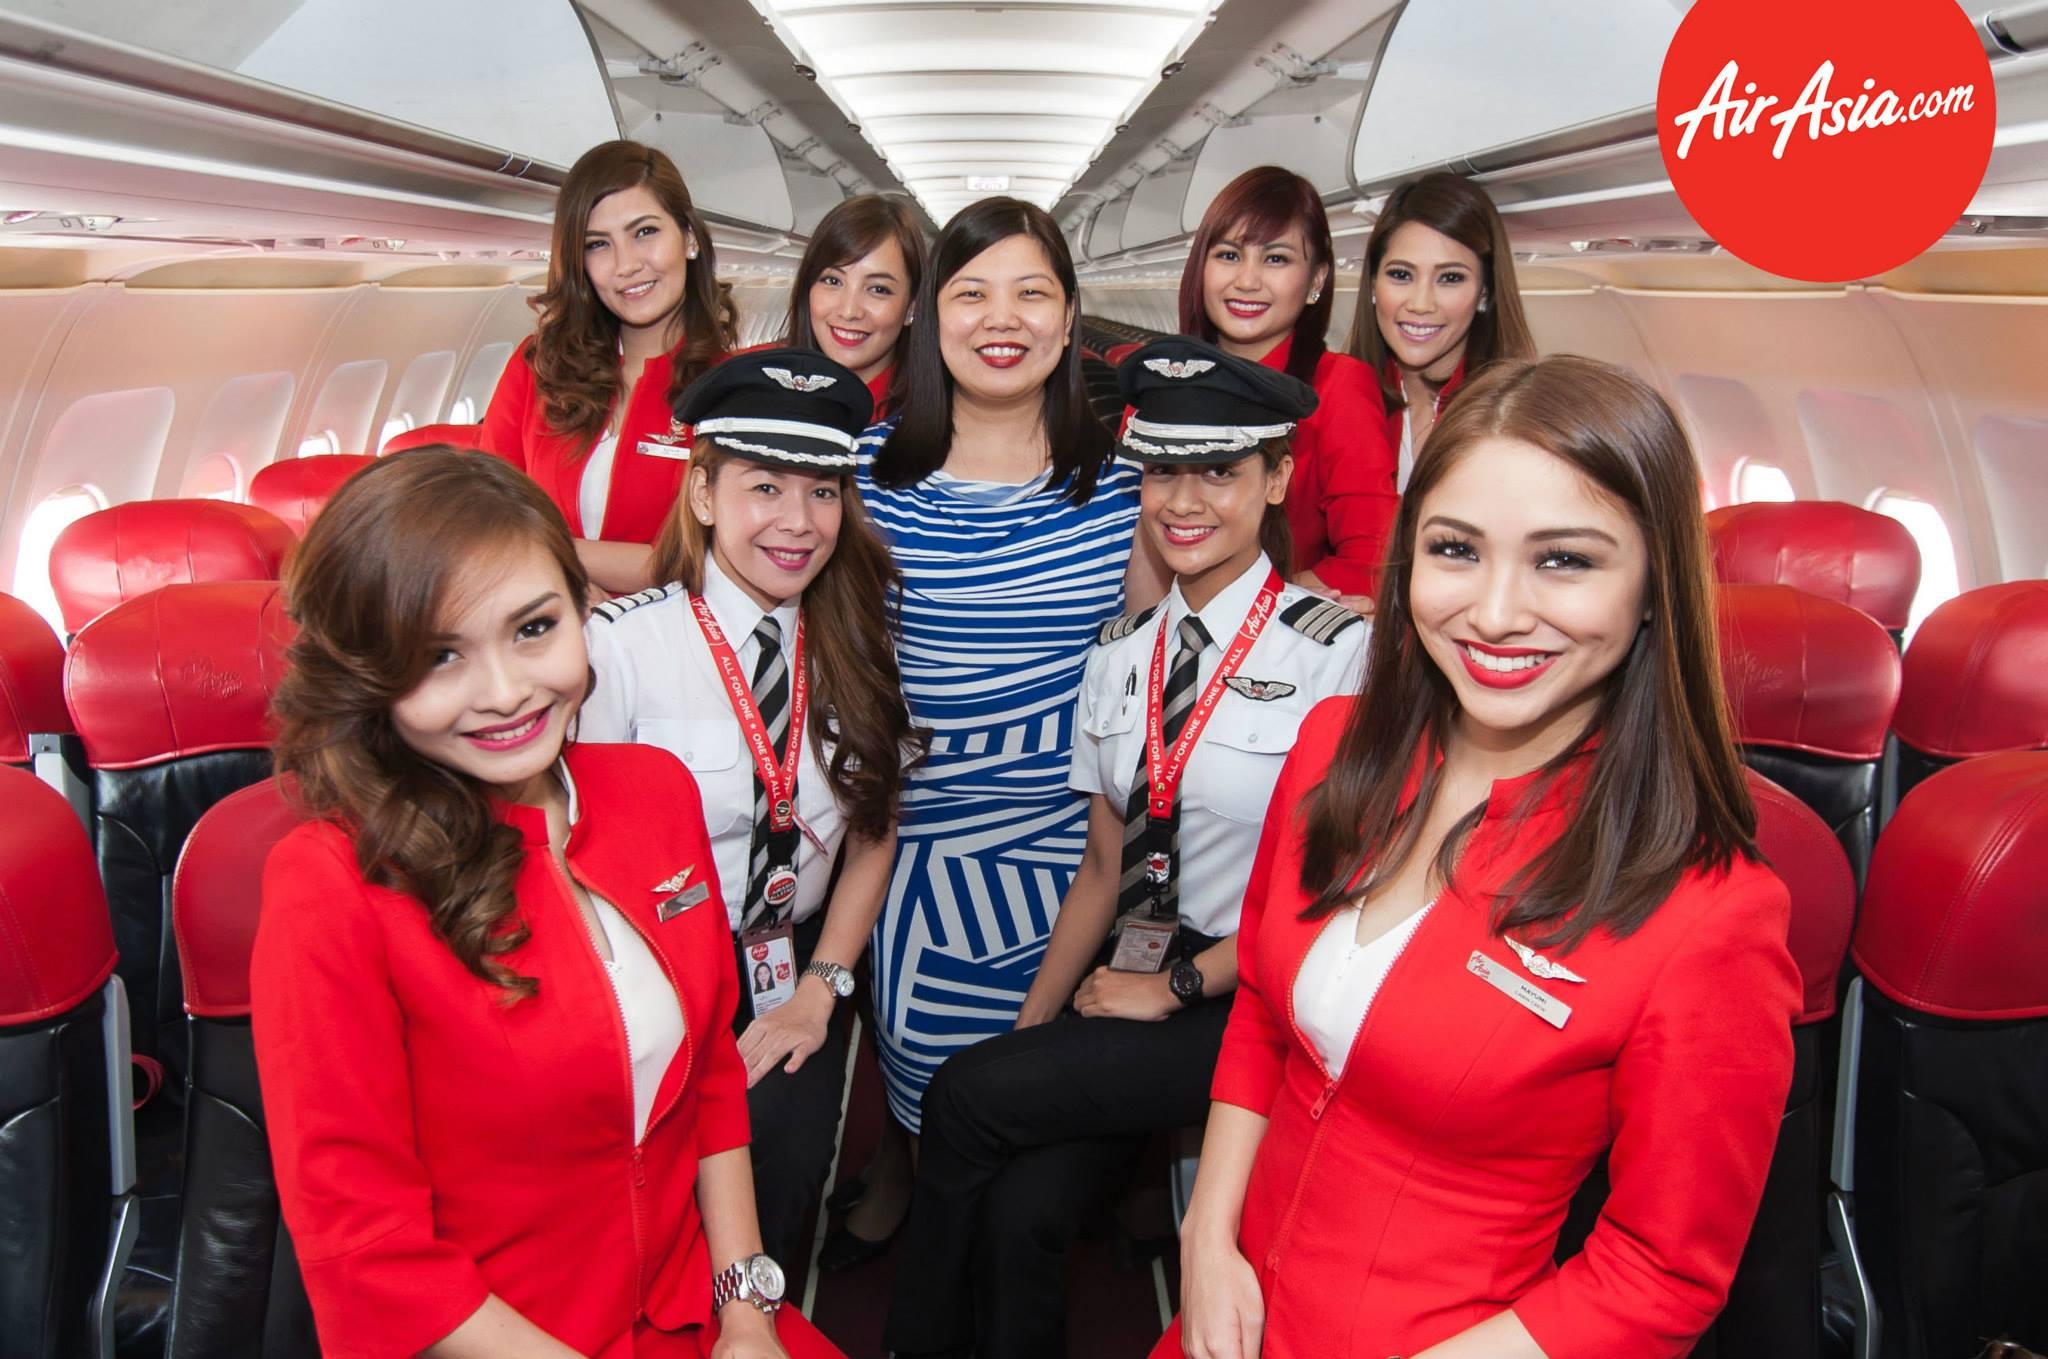 AirAsia marks return of Manila-Davao flight with an all-female flight crew